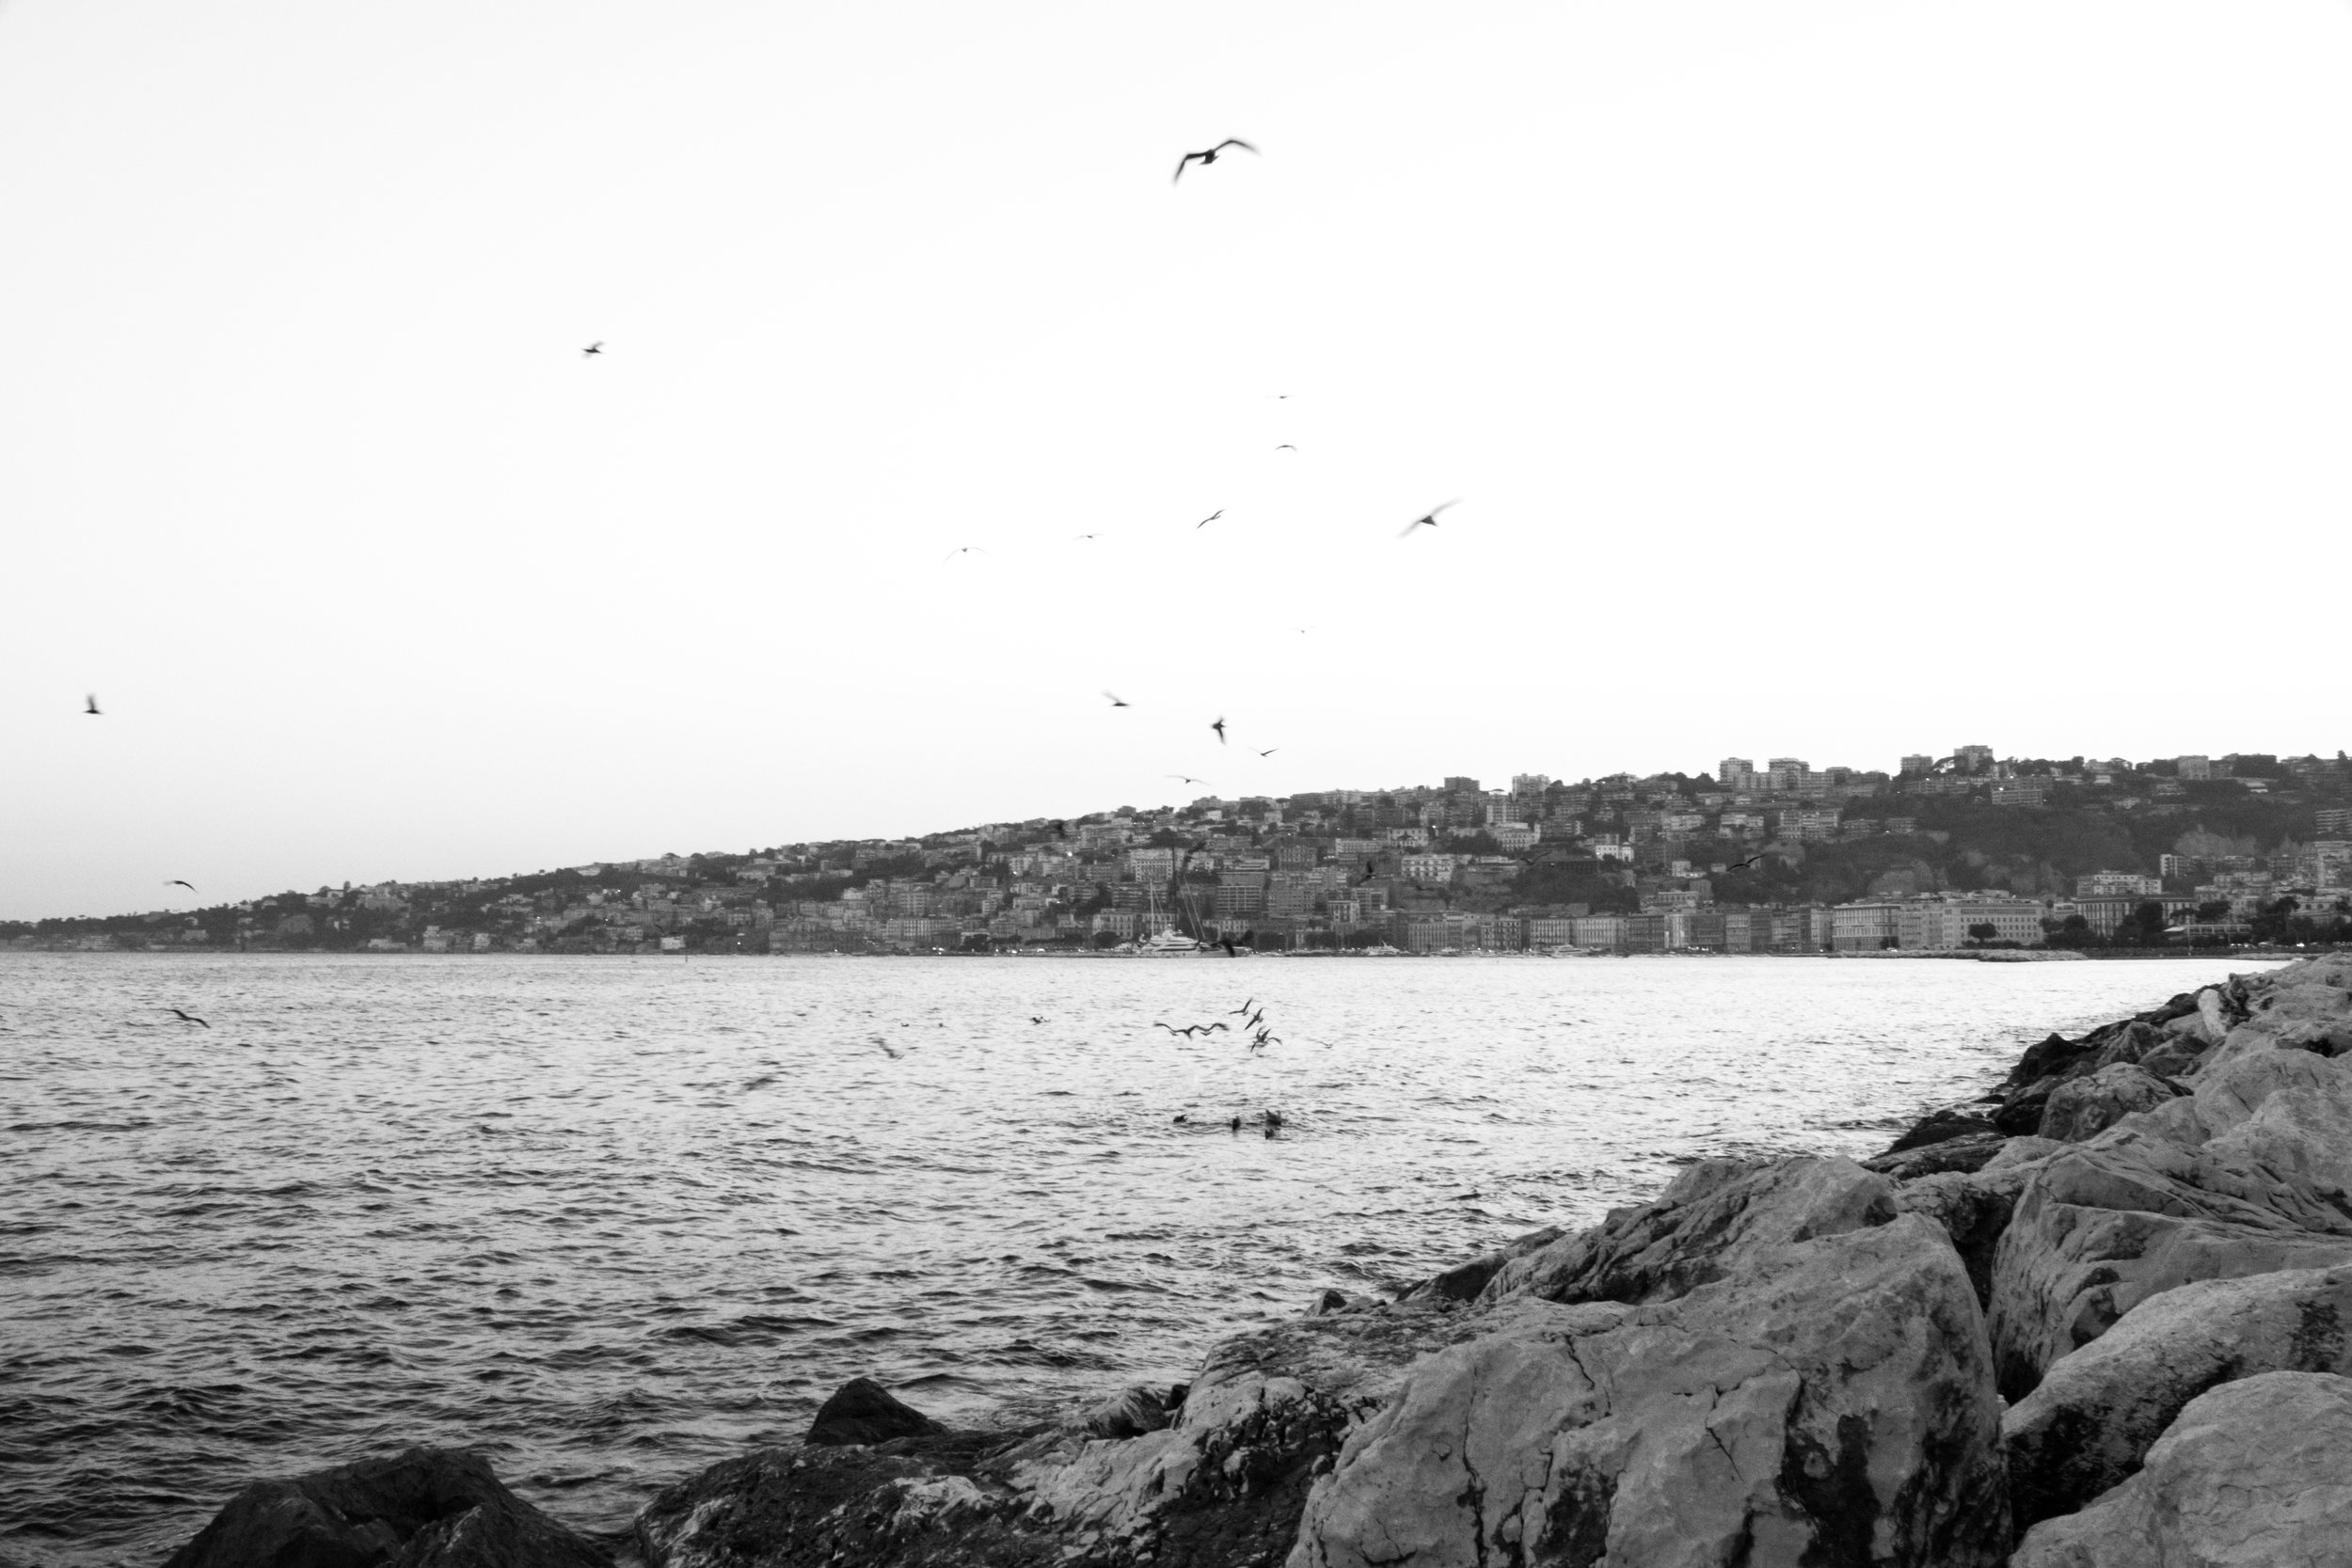 BIRDS OVER THE COAST OF NAPLES